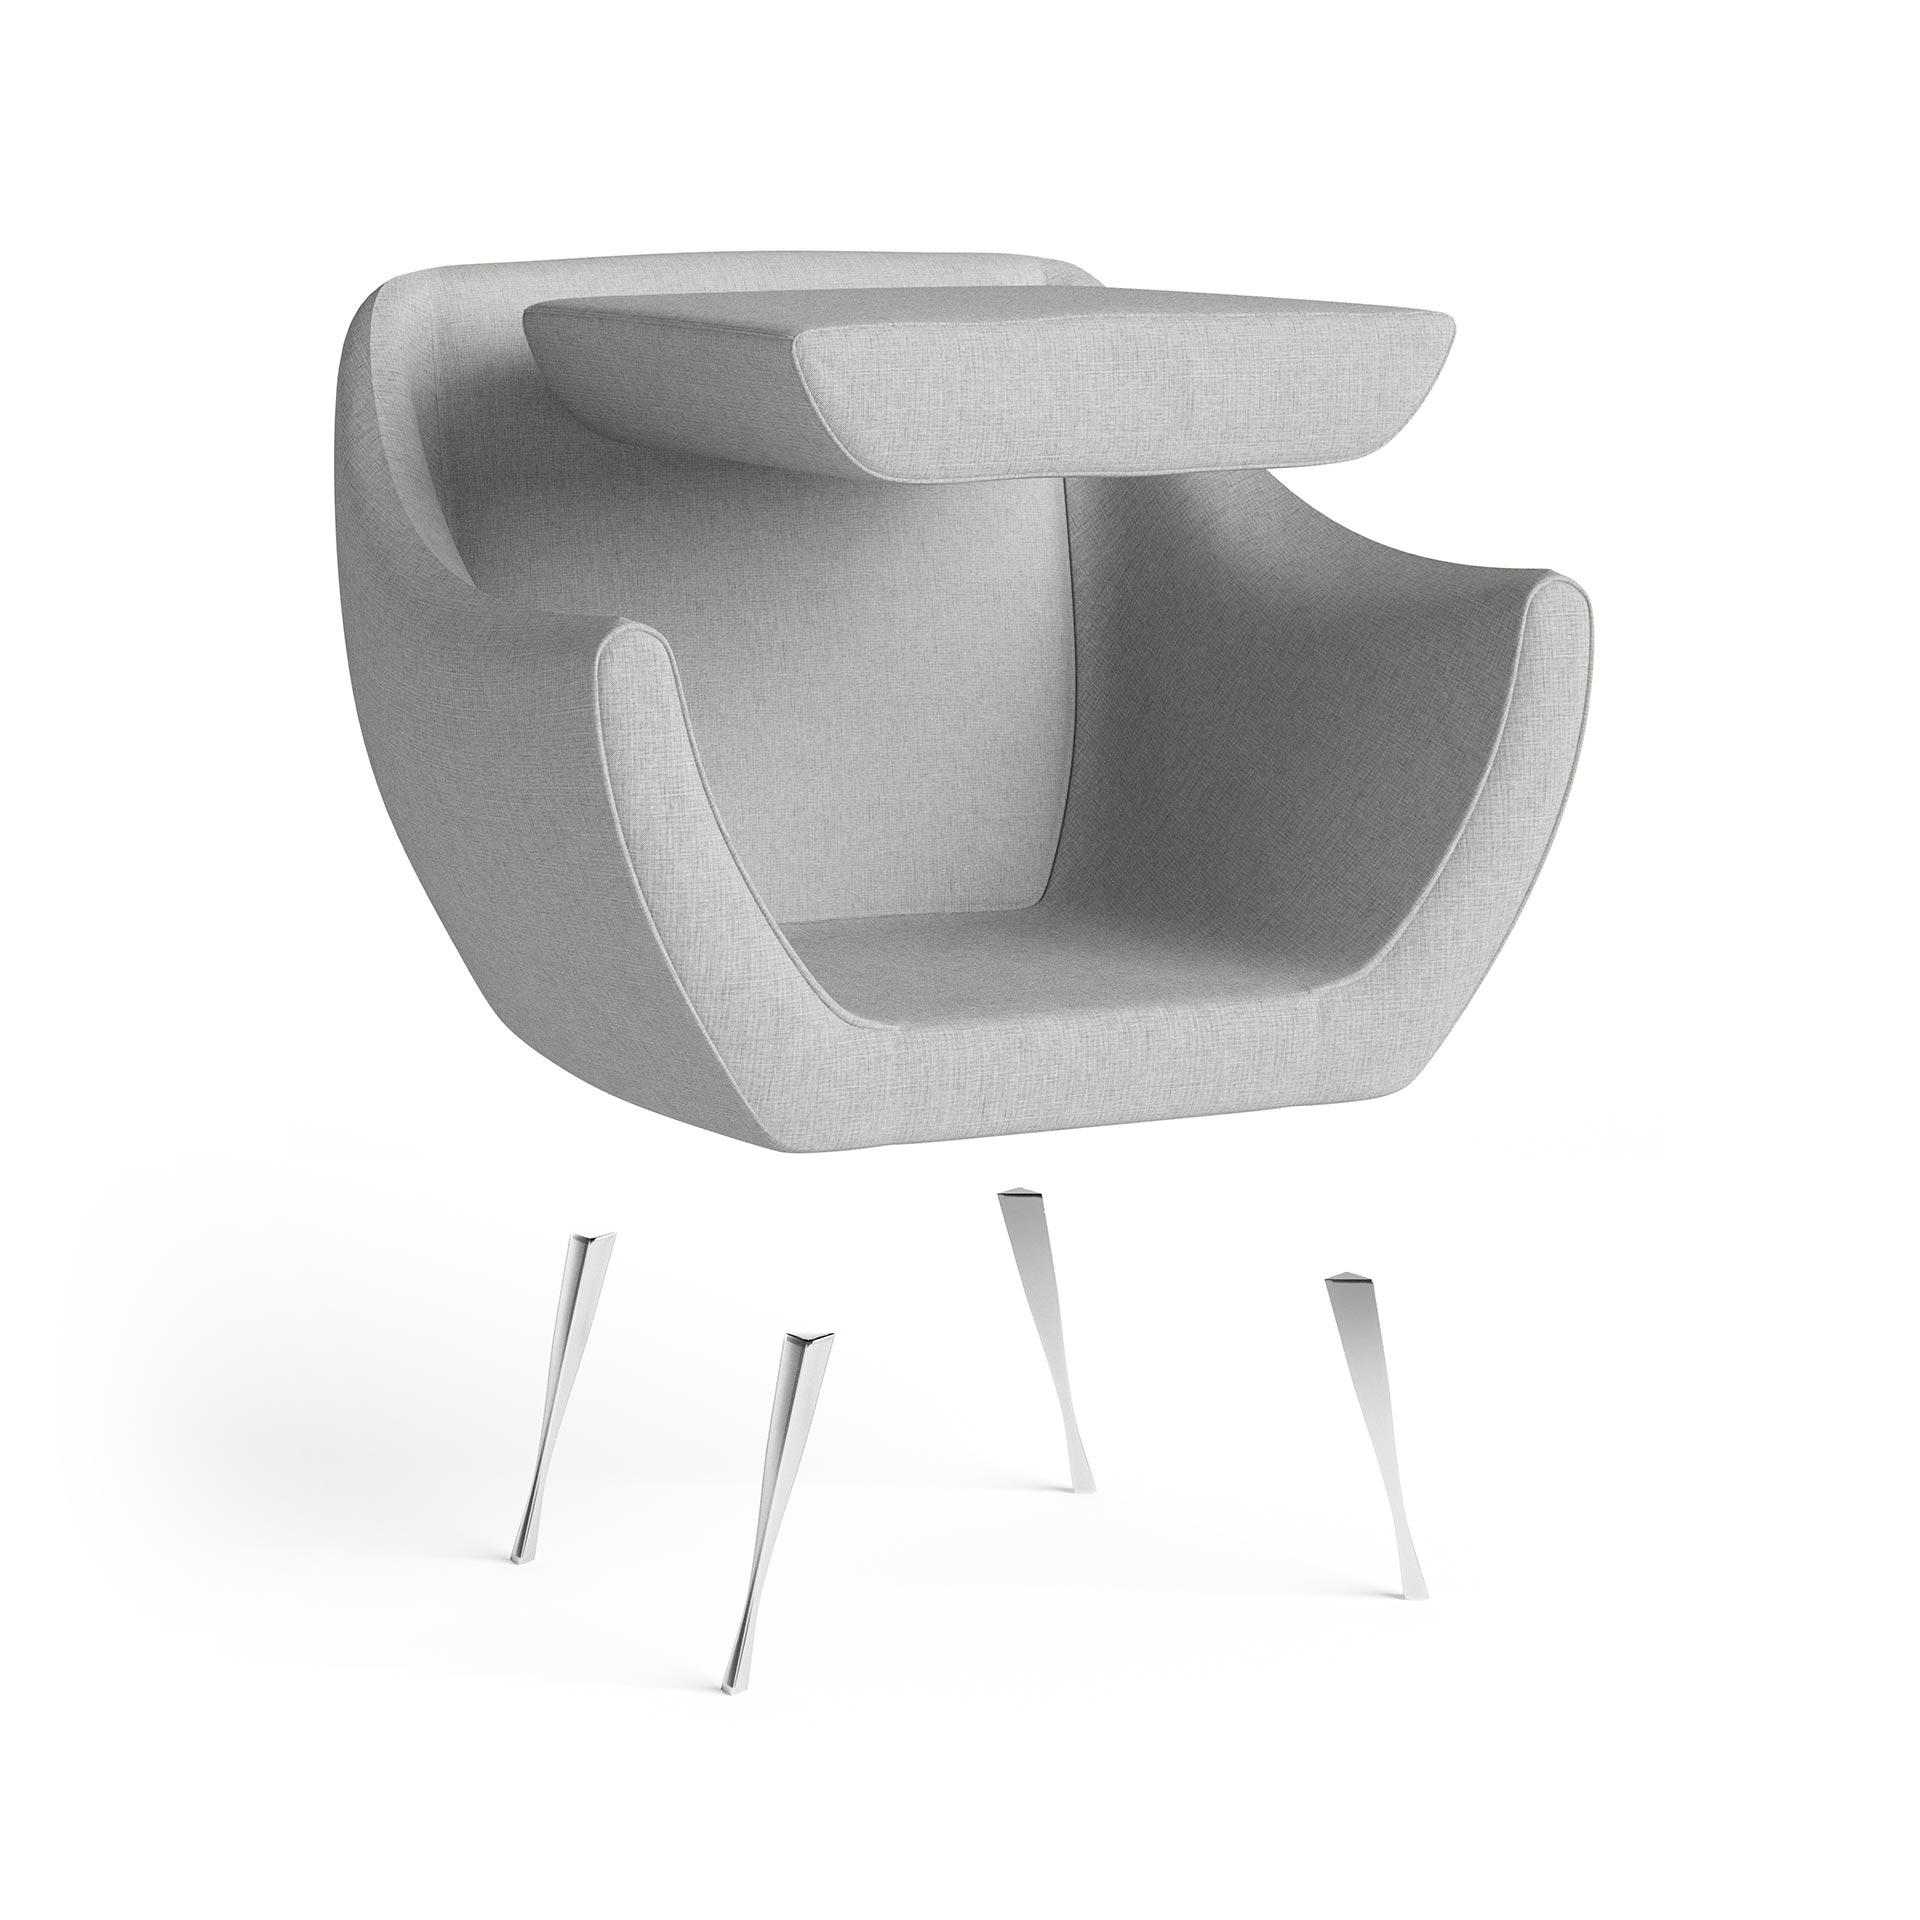 Rita Furniture Exploded Rendering Light Grey